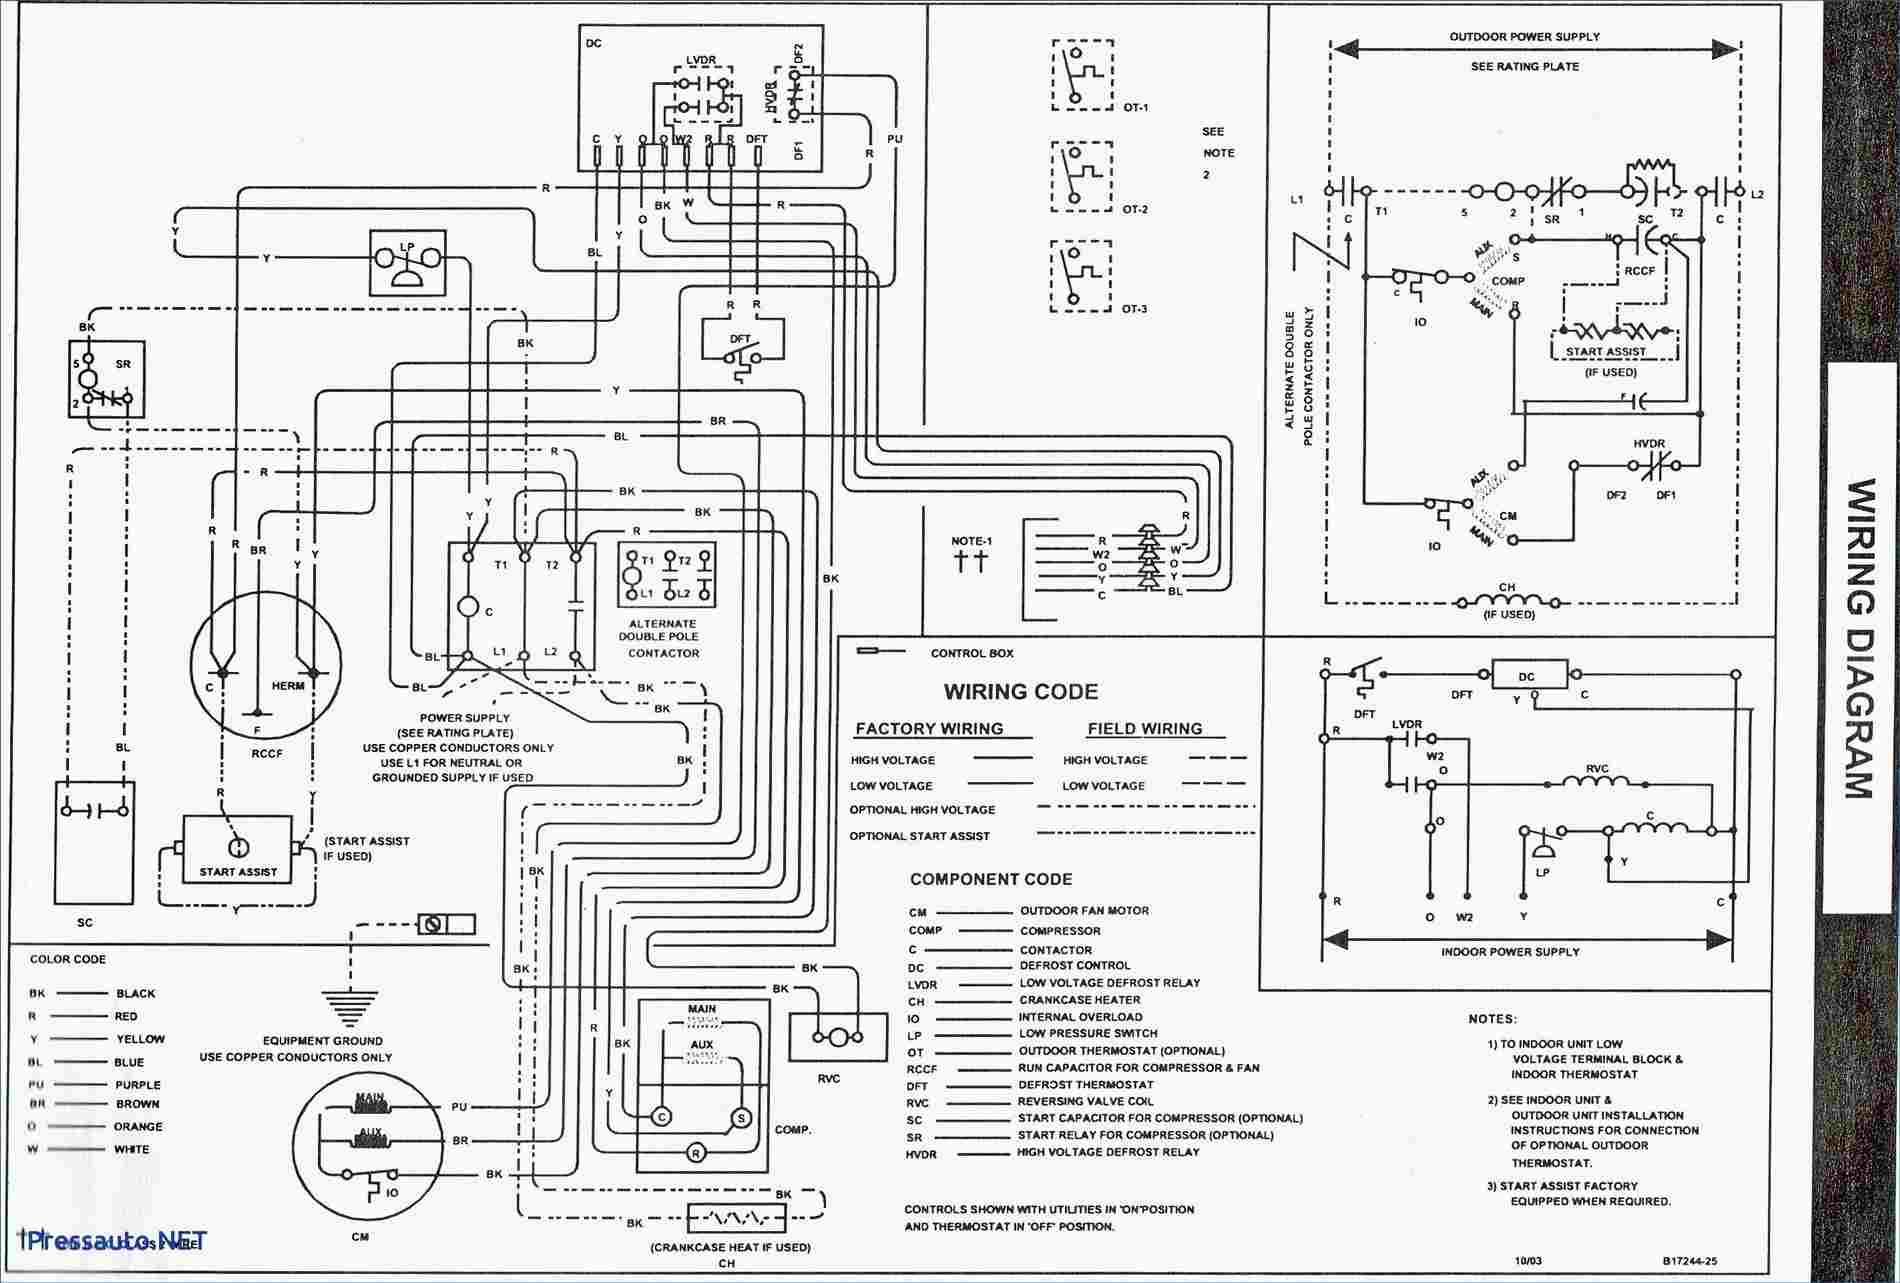 Schematic Of Bryant Gas Furnace Wiring Diagram Data